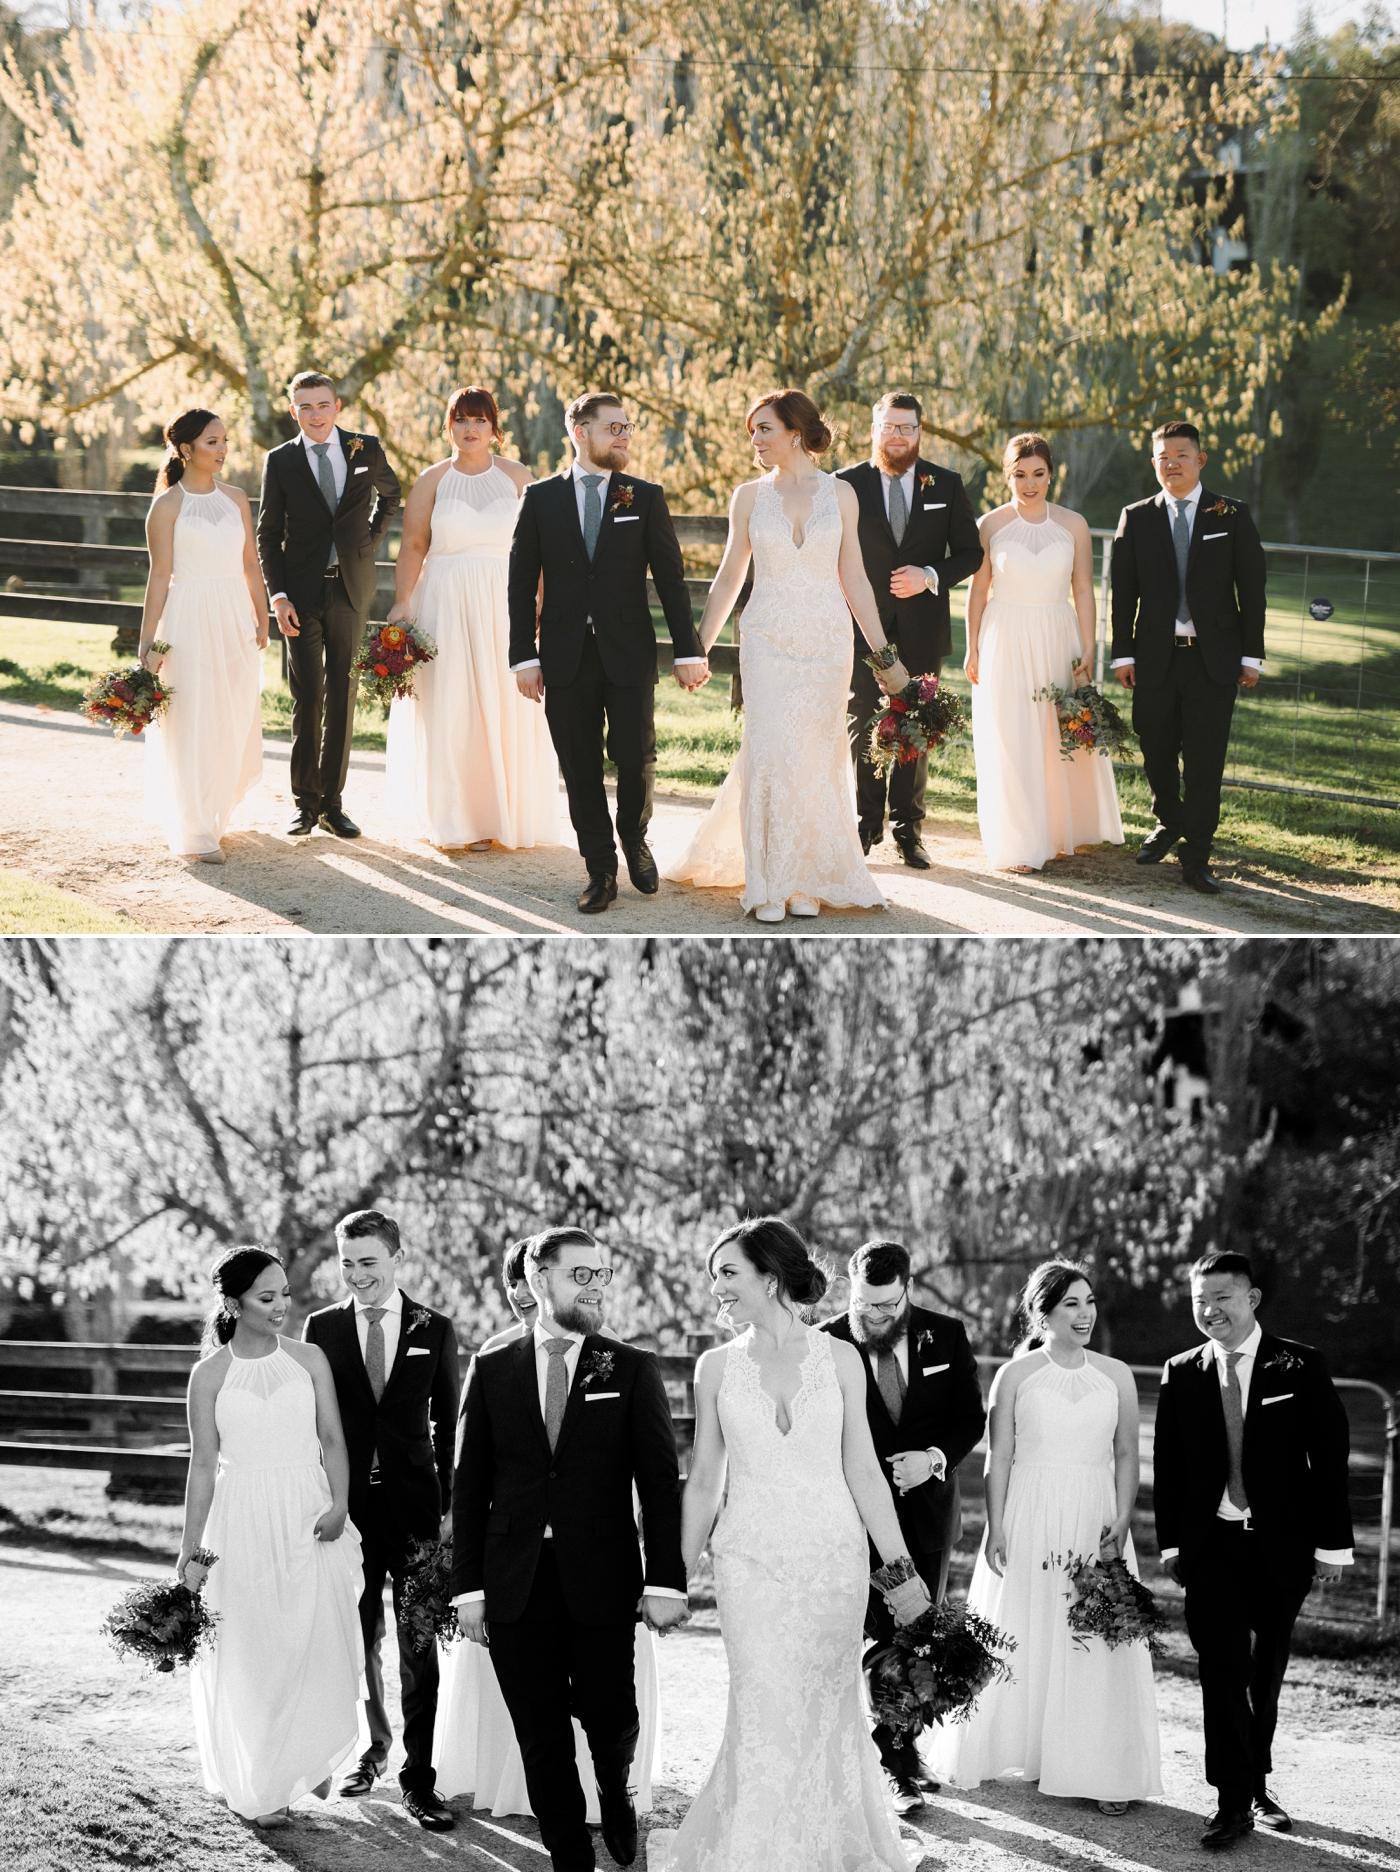 Erin & Ryan - Natural Wedding Photographer in Adelaide - Maximillians Wedding - Simple and Modern Wedding Photographer - Katherine Schultz - www.katherineschultzphotography.com_0041.jpg